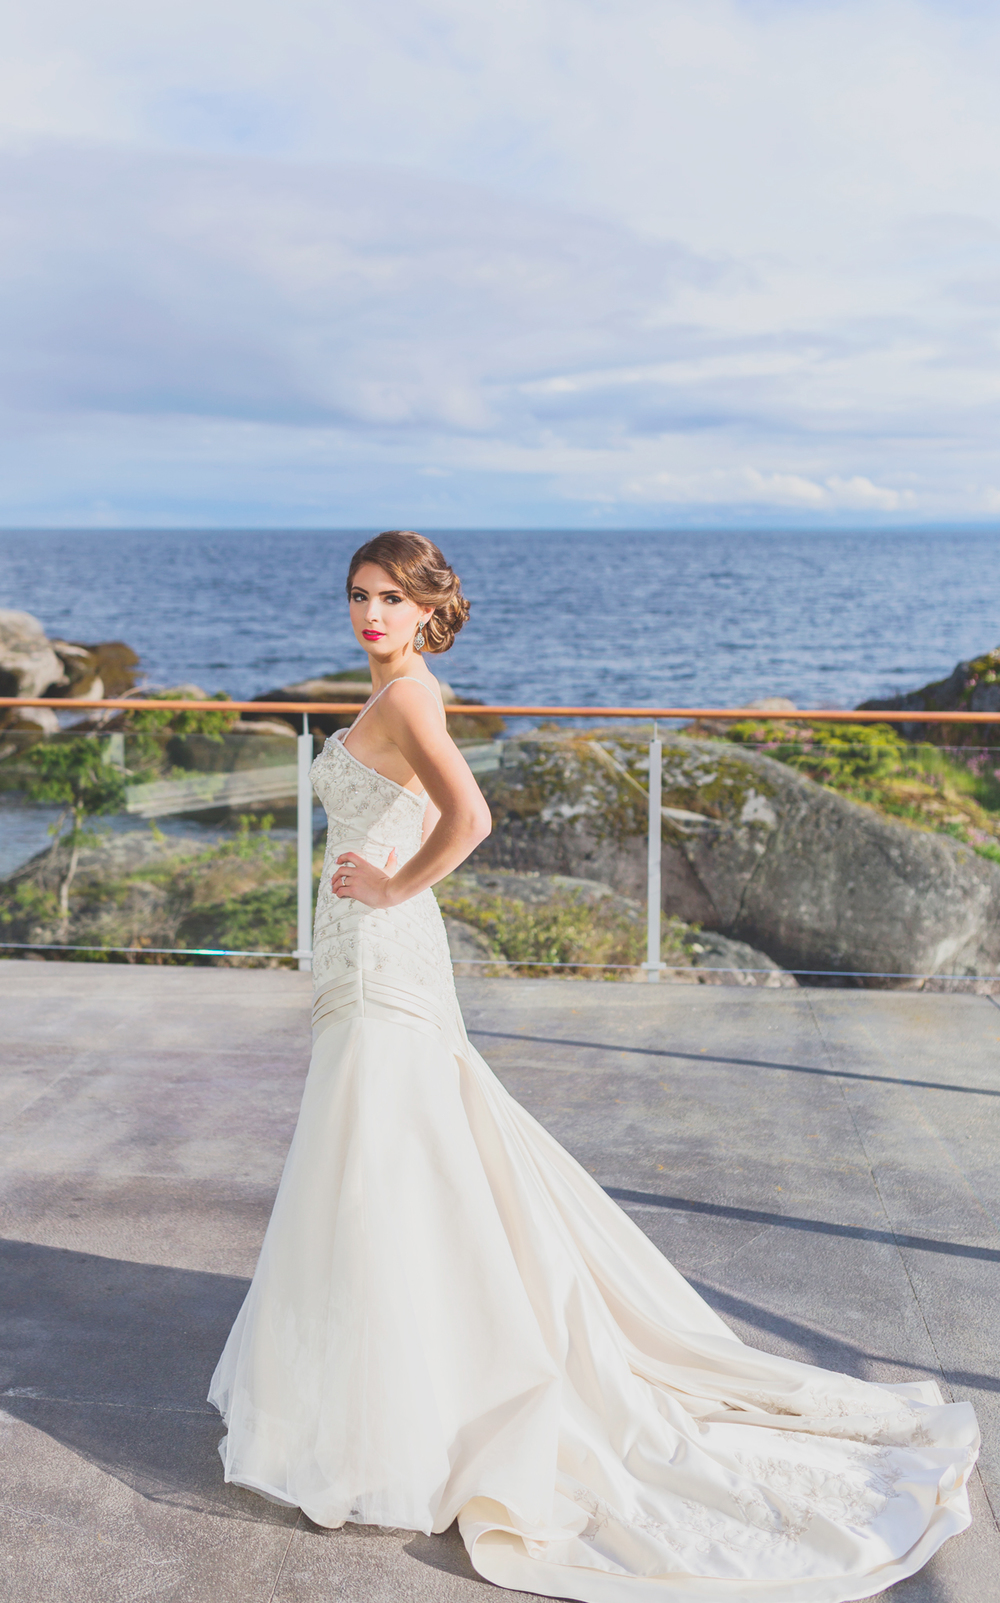 IMG_6764-BRIDAL-EDITORIAL-JENNIFER-PICARD-PHOTOGRAPHY-FINE-ART-WEDDINGS.jpg